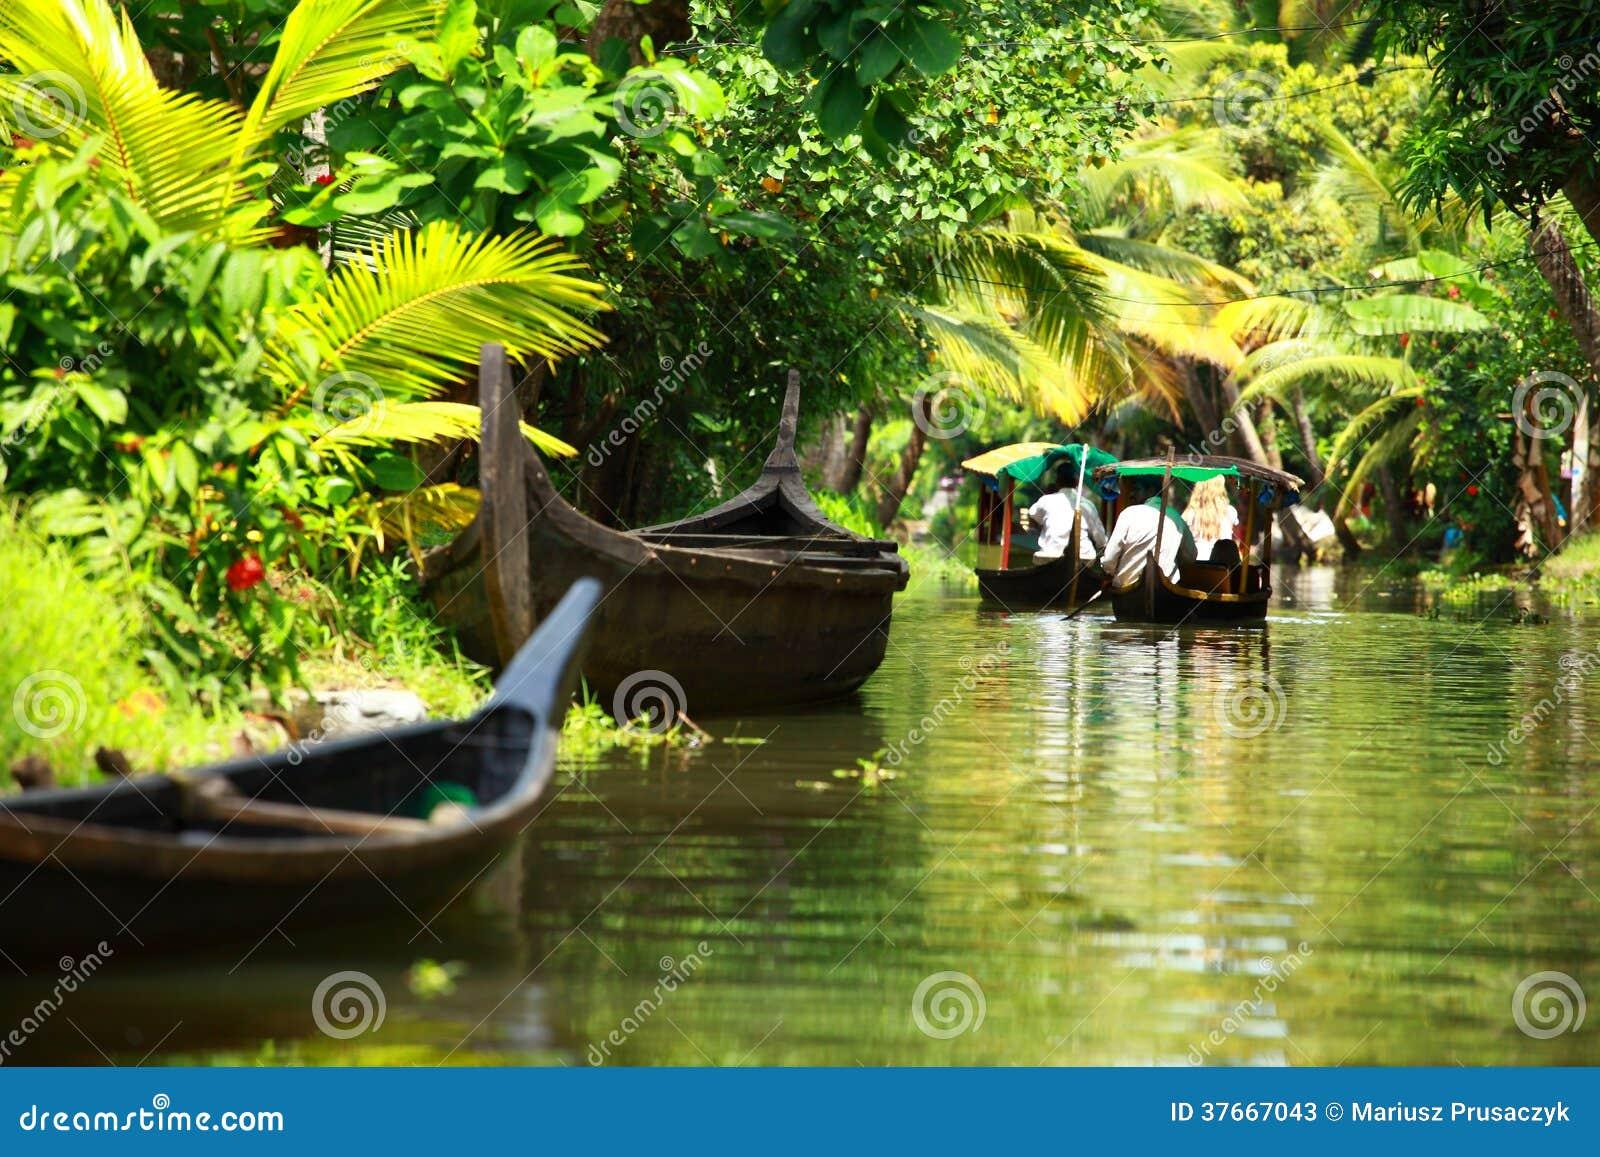 Palm tropisch bos in binnenwater van Kochin, Kerala, India